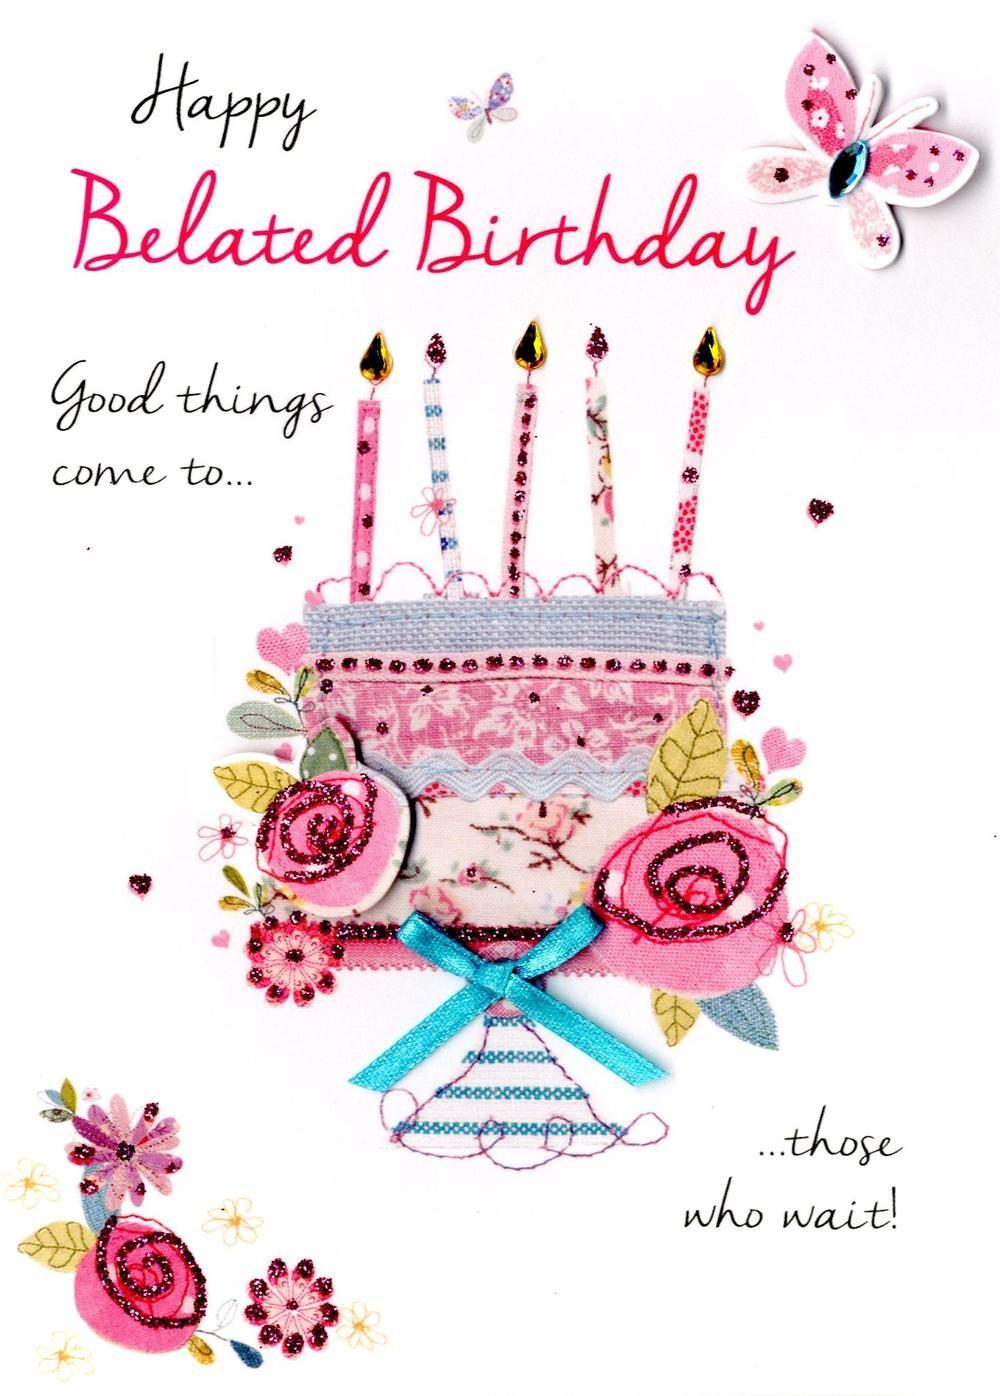 Happy Belated Birthday Greeting Card Belated birthday